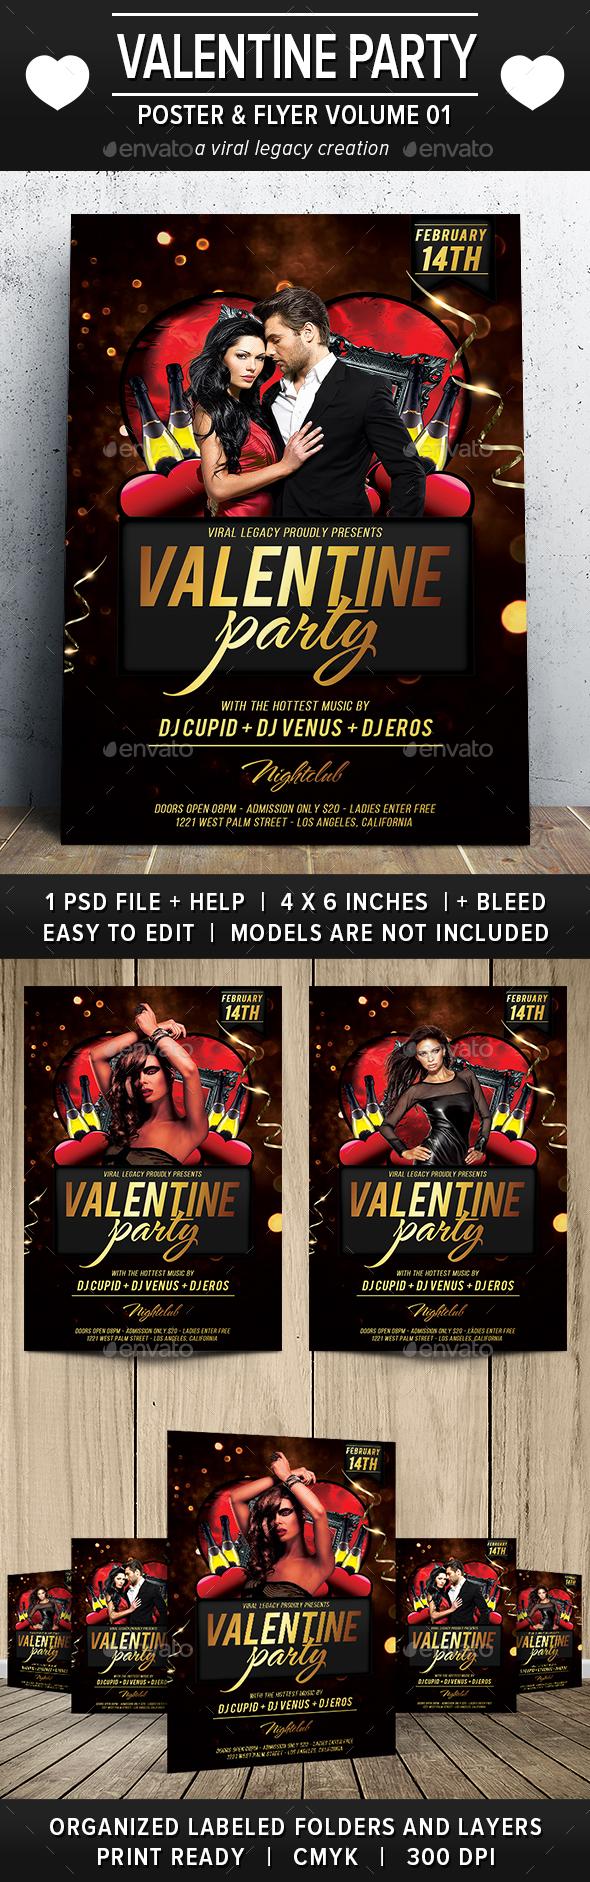 Valentine Party Poster / Flyer V01 - Flyers Print Templates